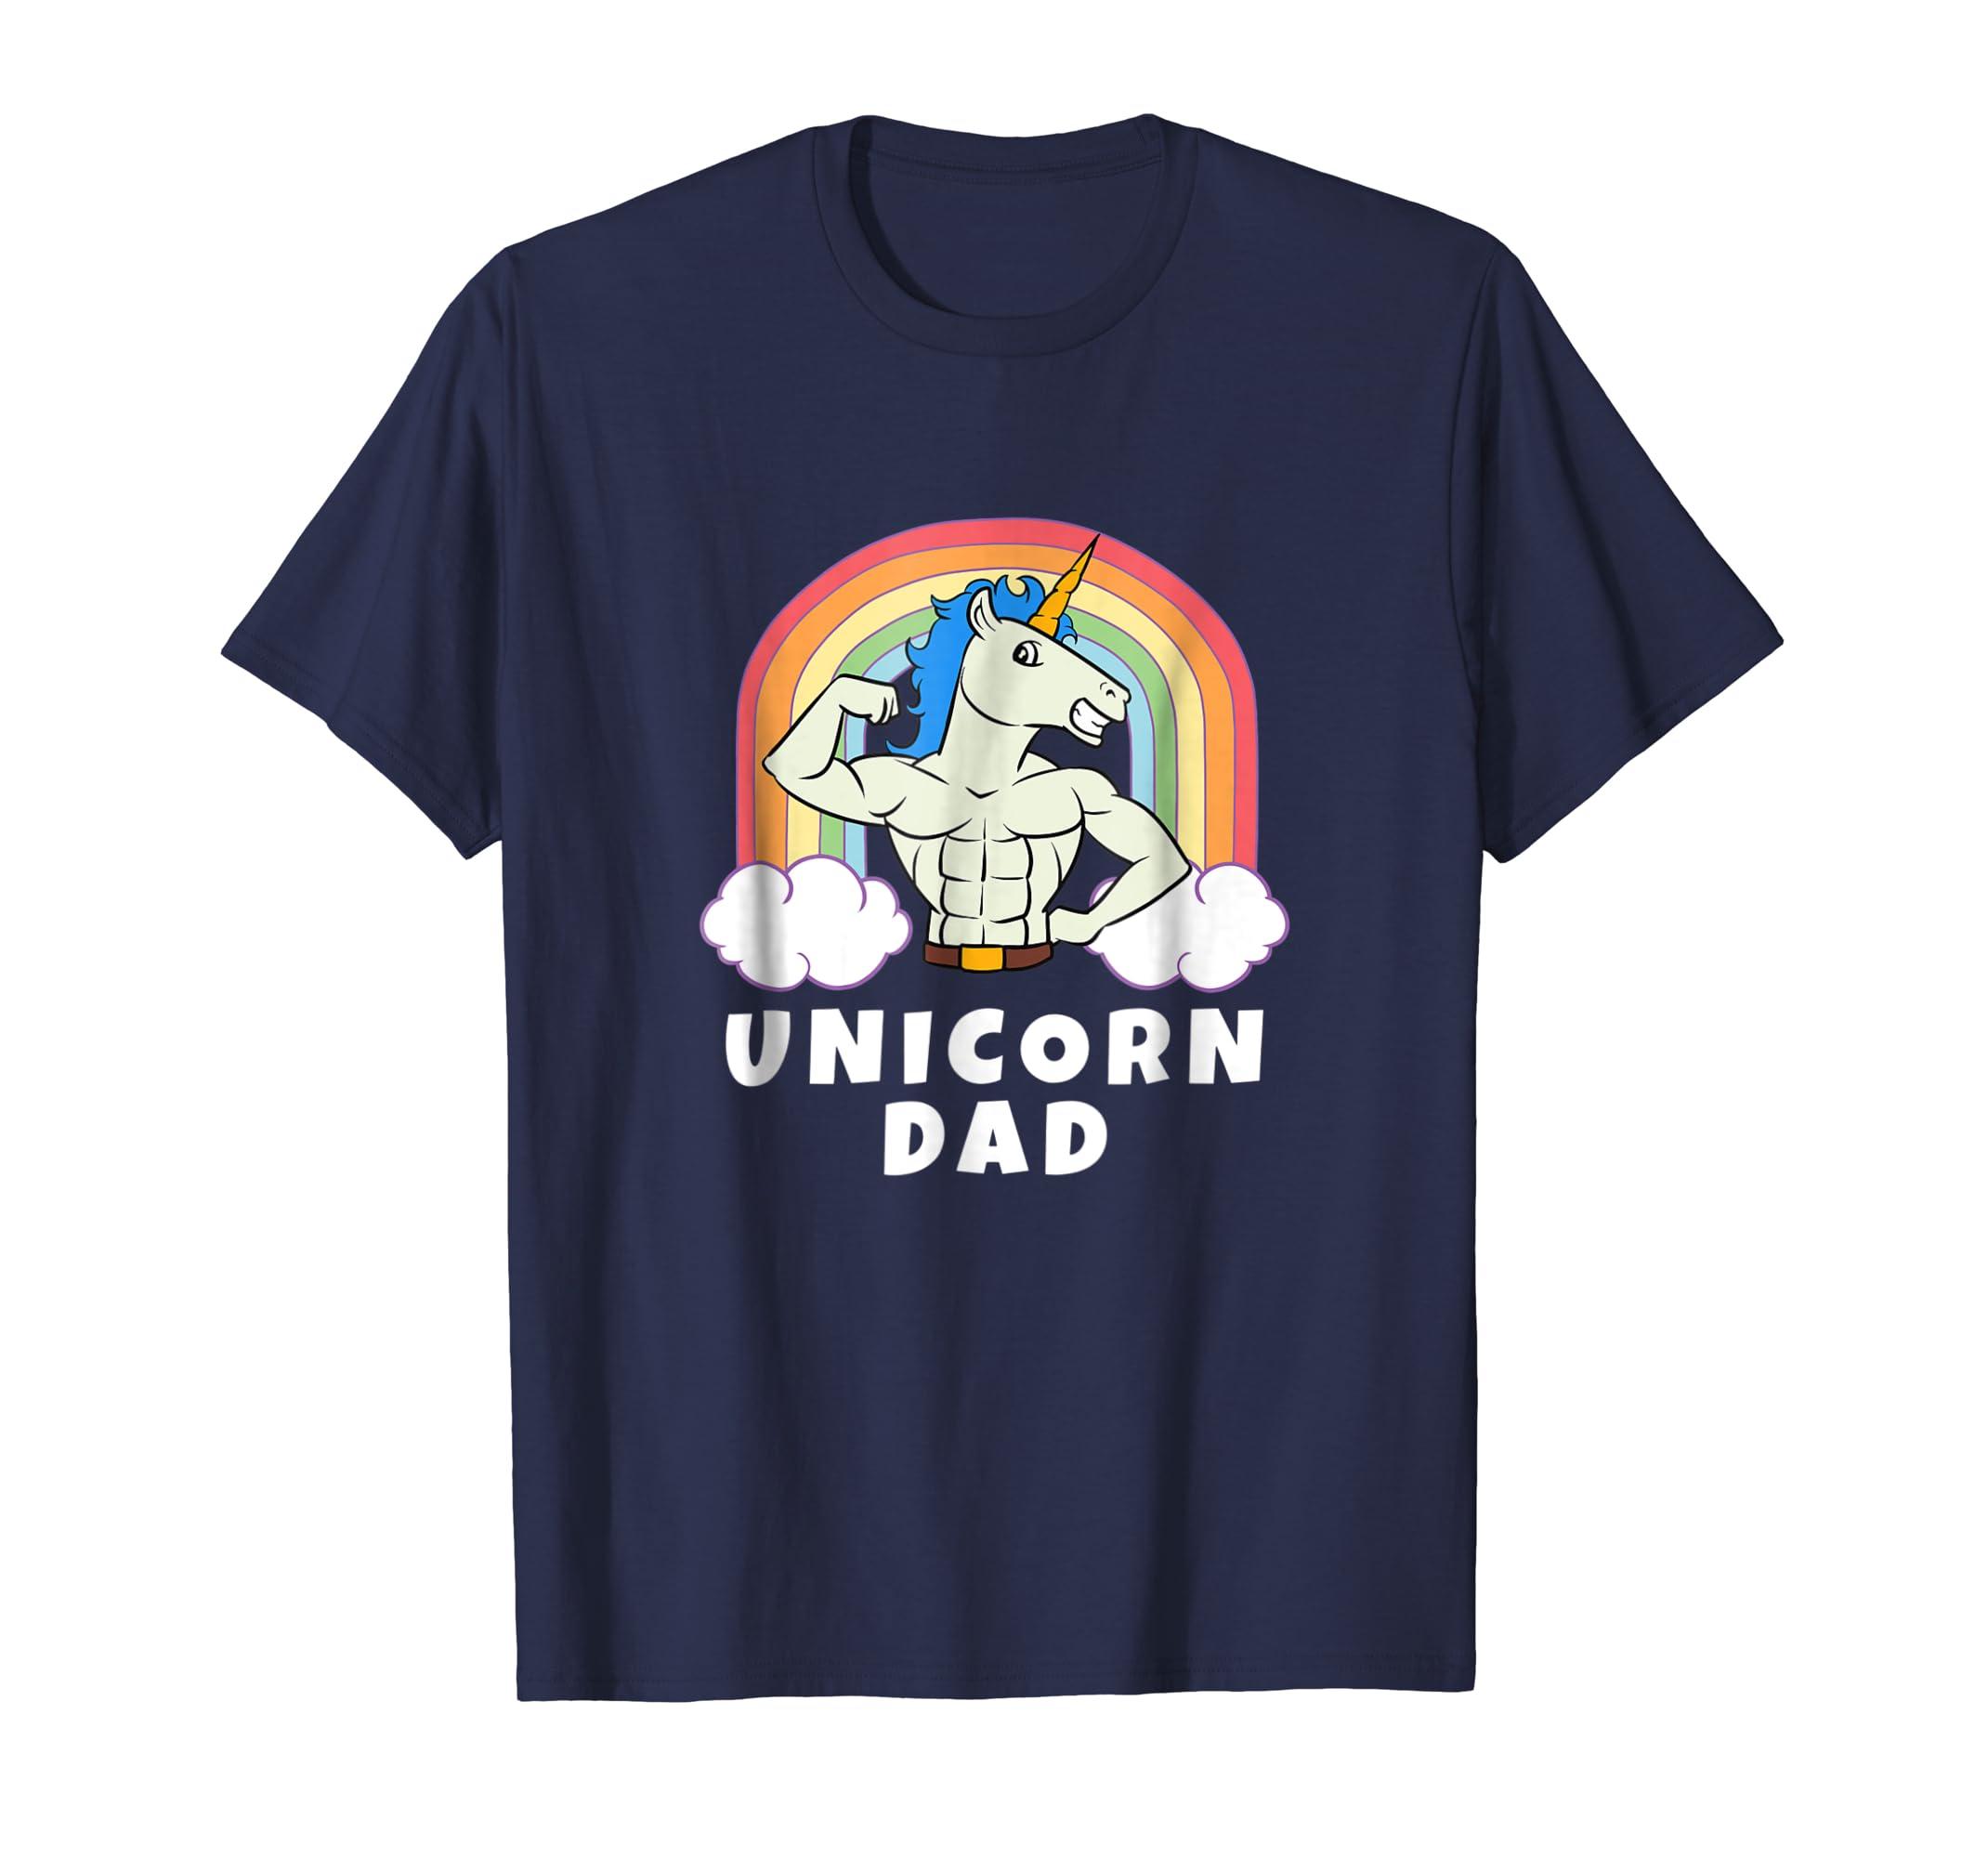 43a02e85 Amazon.com: Mens Unicorn Dad Shirt | Funny Birthday Daddy Gift T-Shirt:  Clothing